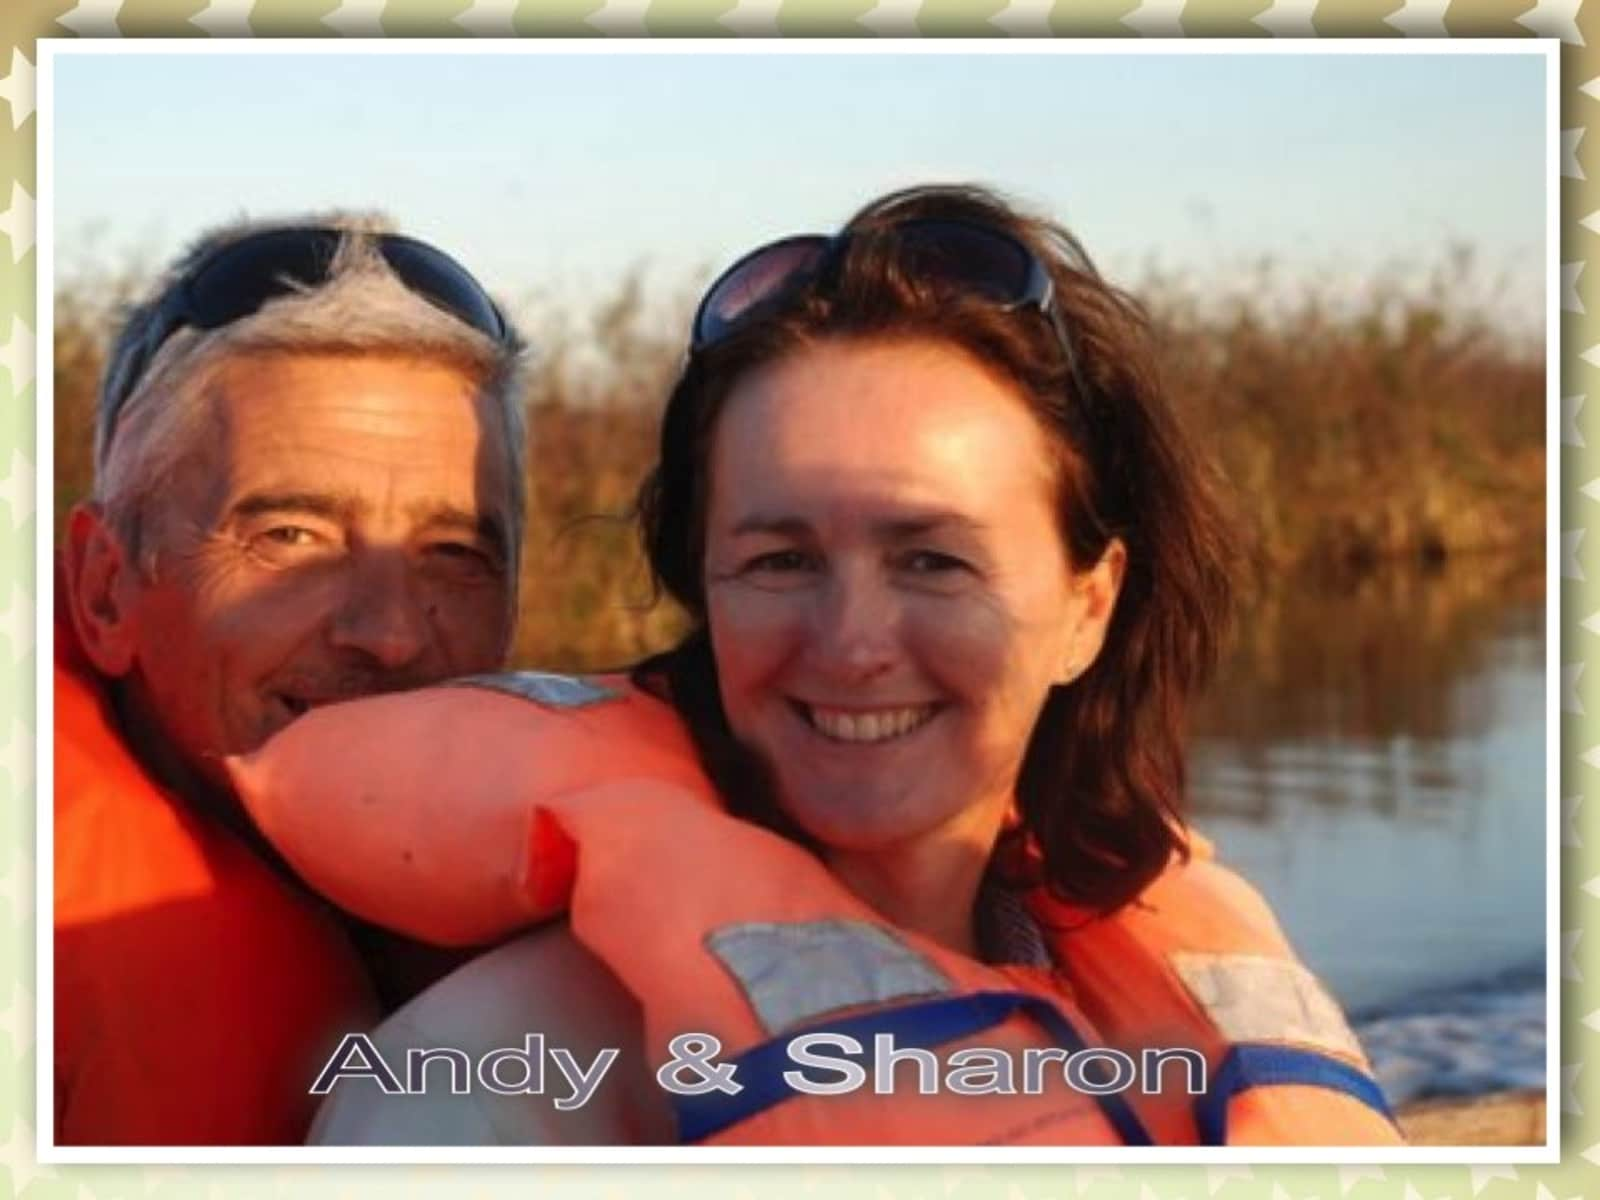 Andy & Sharon from Brighton, United Kingdom